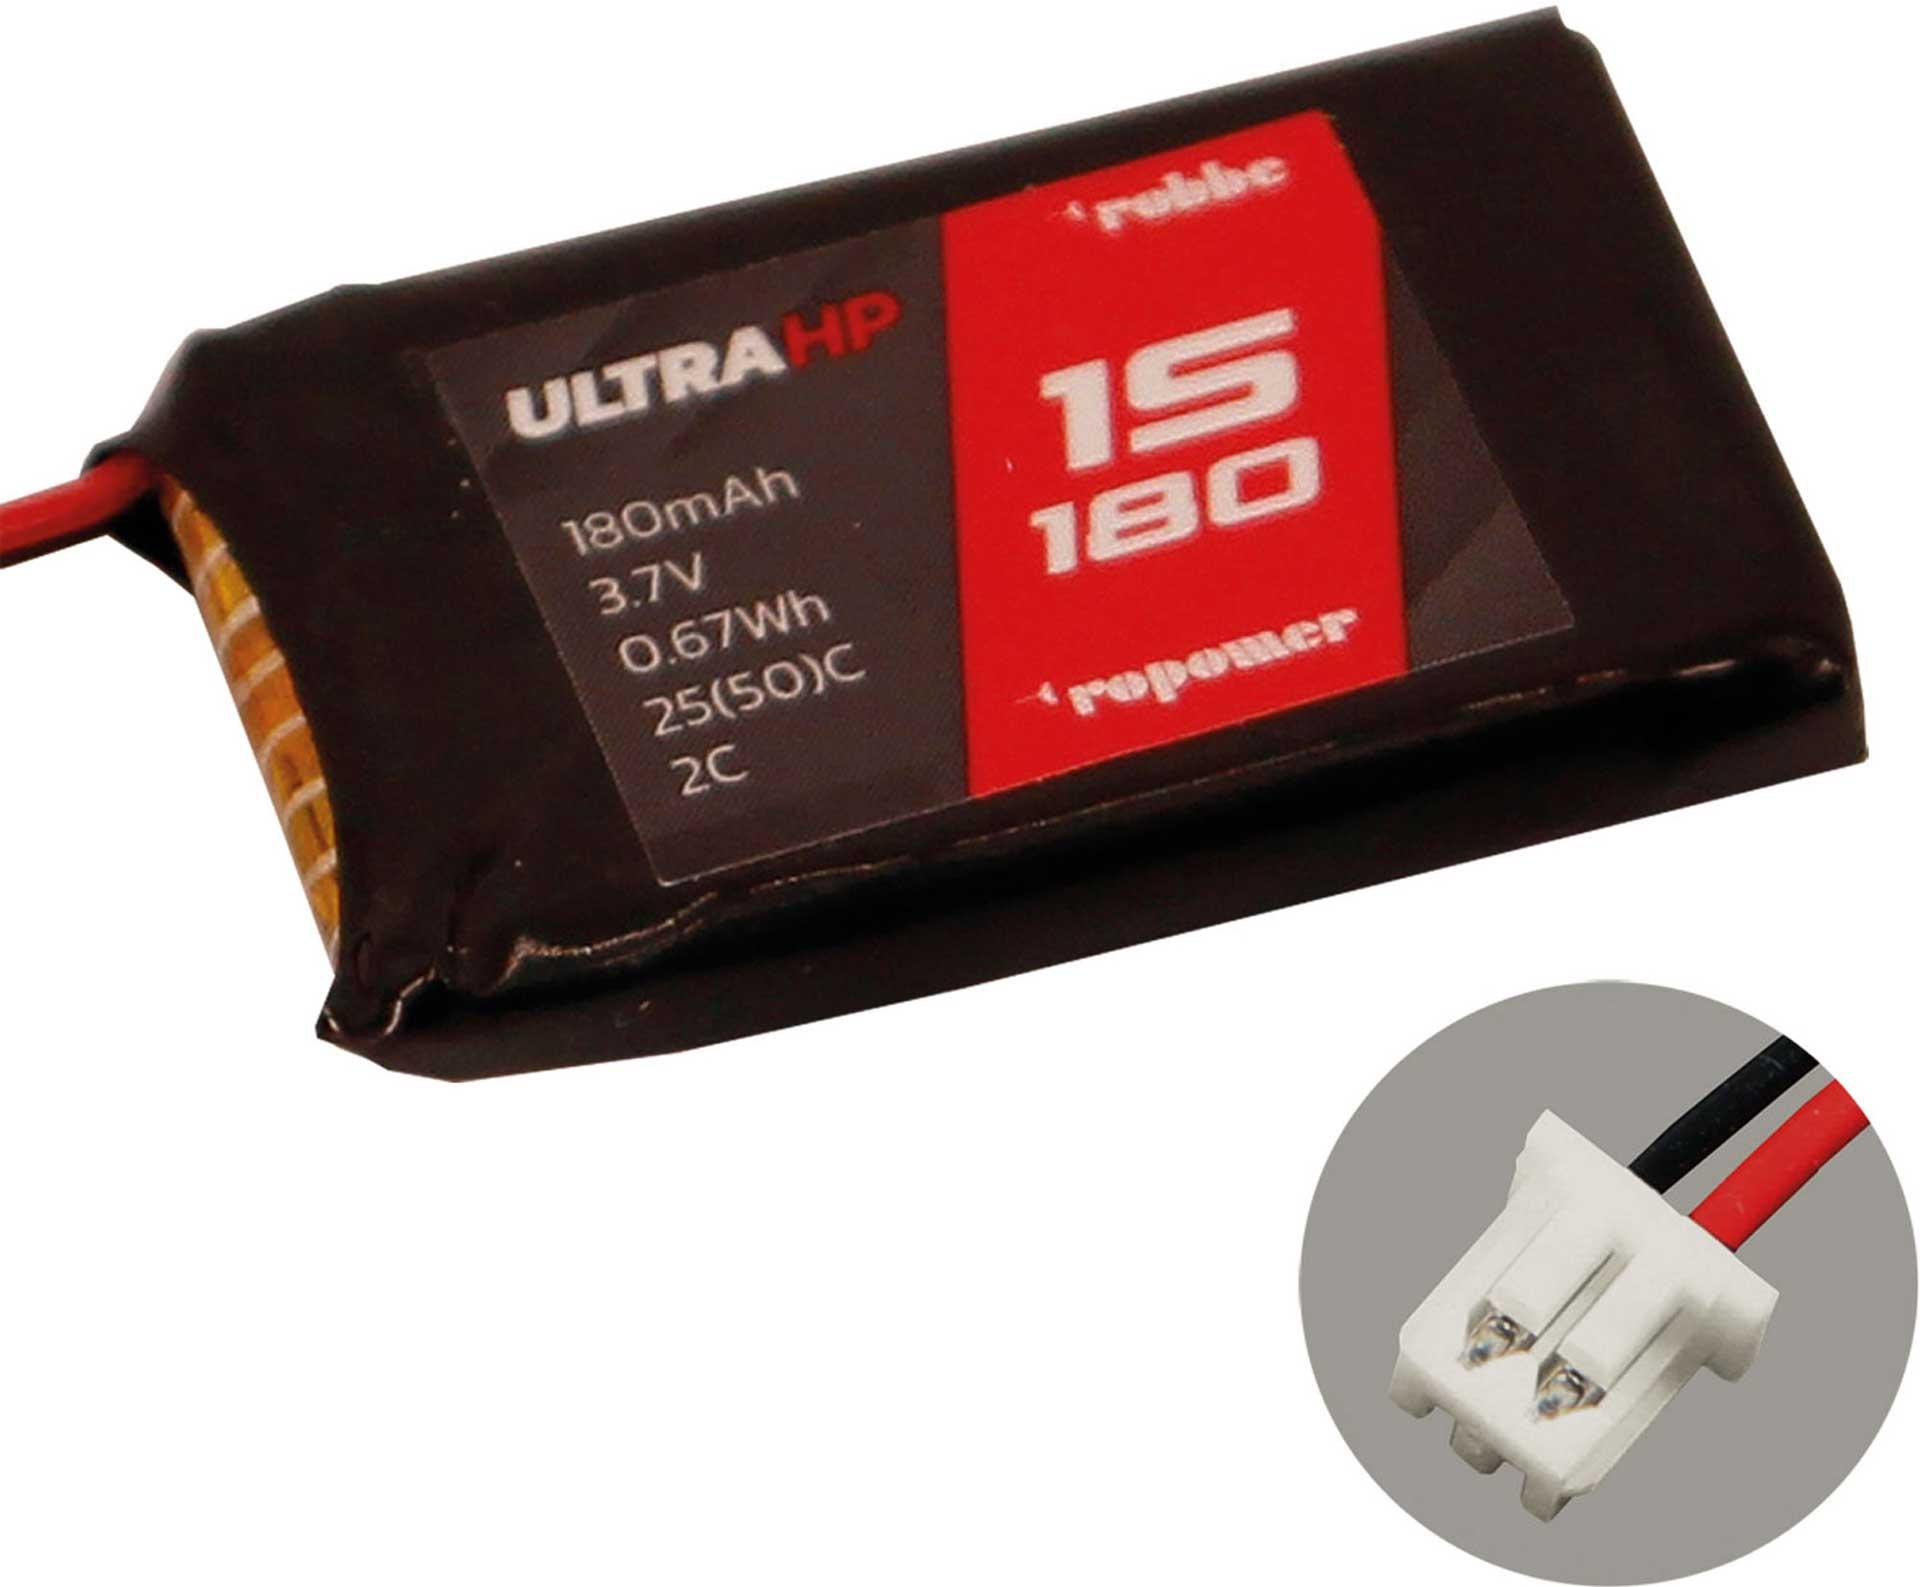 ROBBE RO-POWER ULTRA HP 180MAH 3,7 VOLT 1S MOLEX 1.25/ULTRA MICRO 25(50)C LIPO AKKU